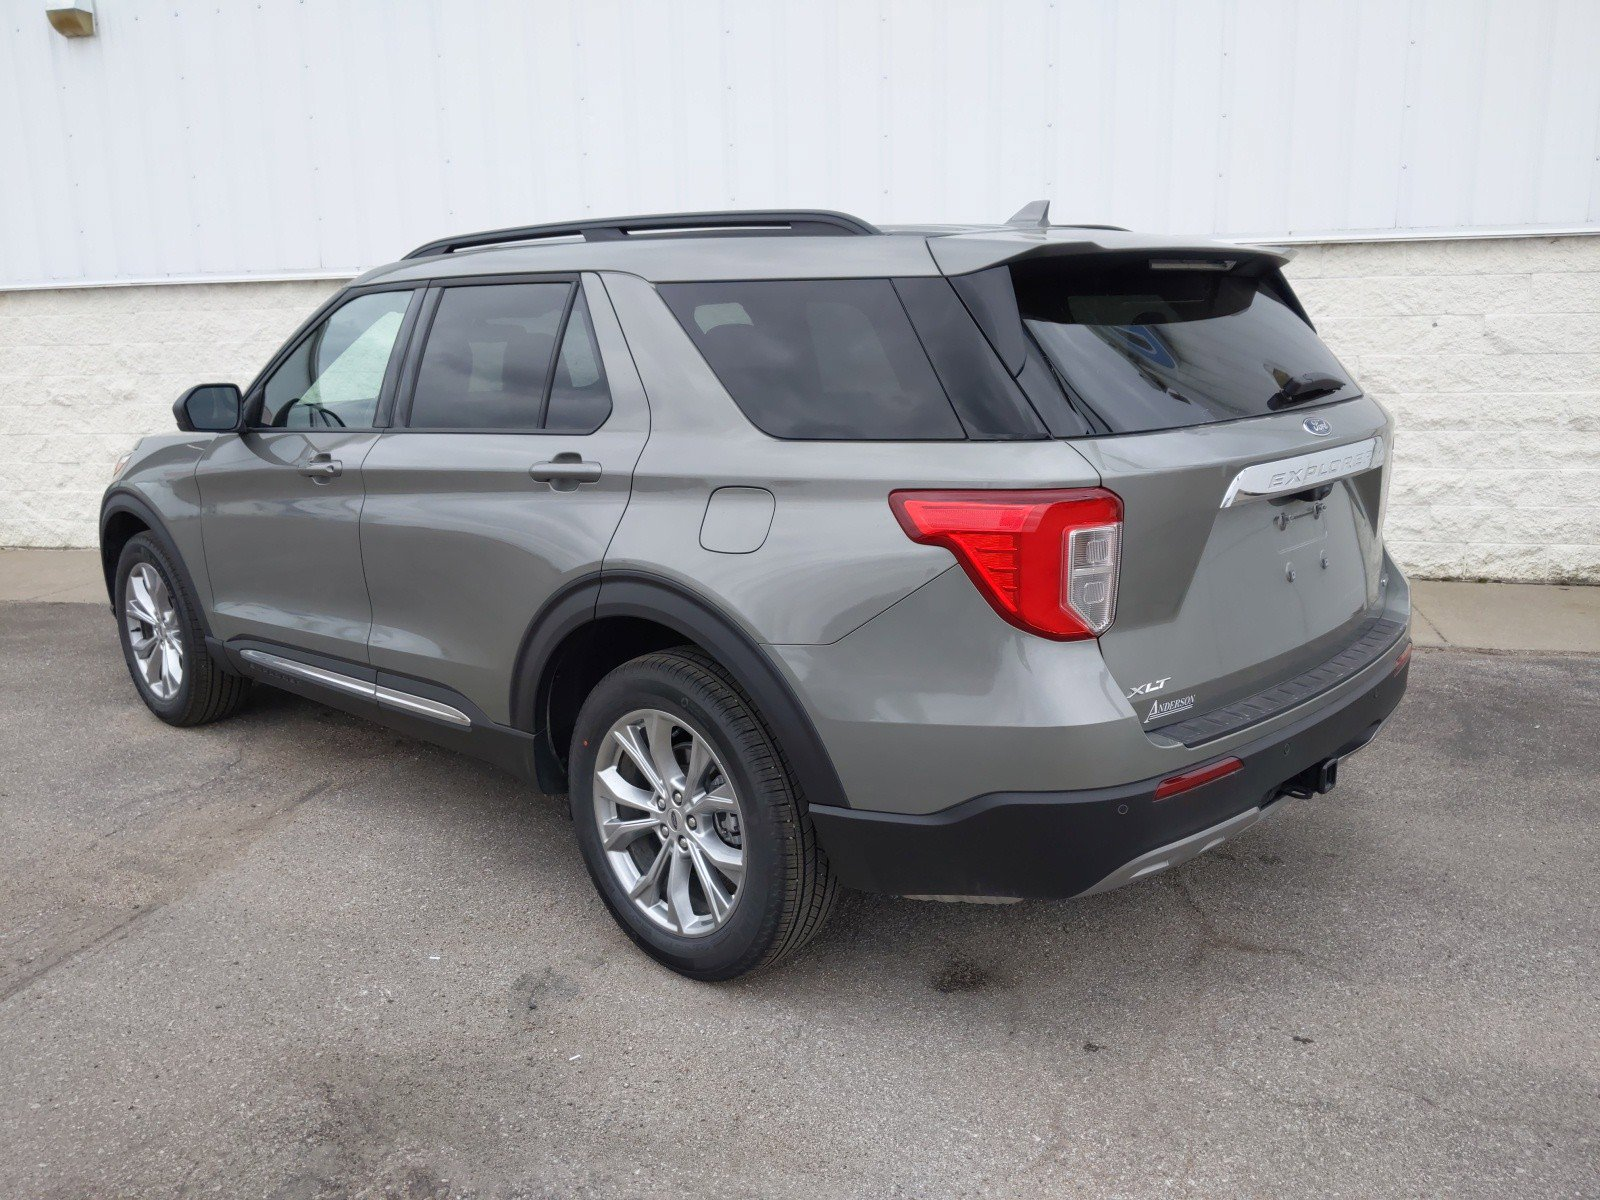 New 2020 Ford Explorer XLT Sport Utility for sale in Lincoln NE